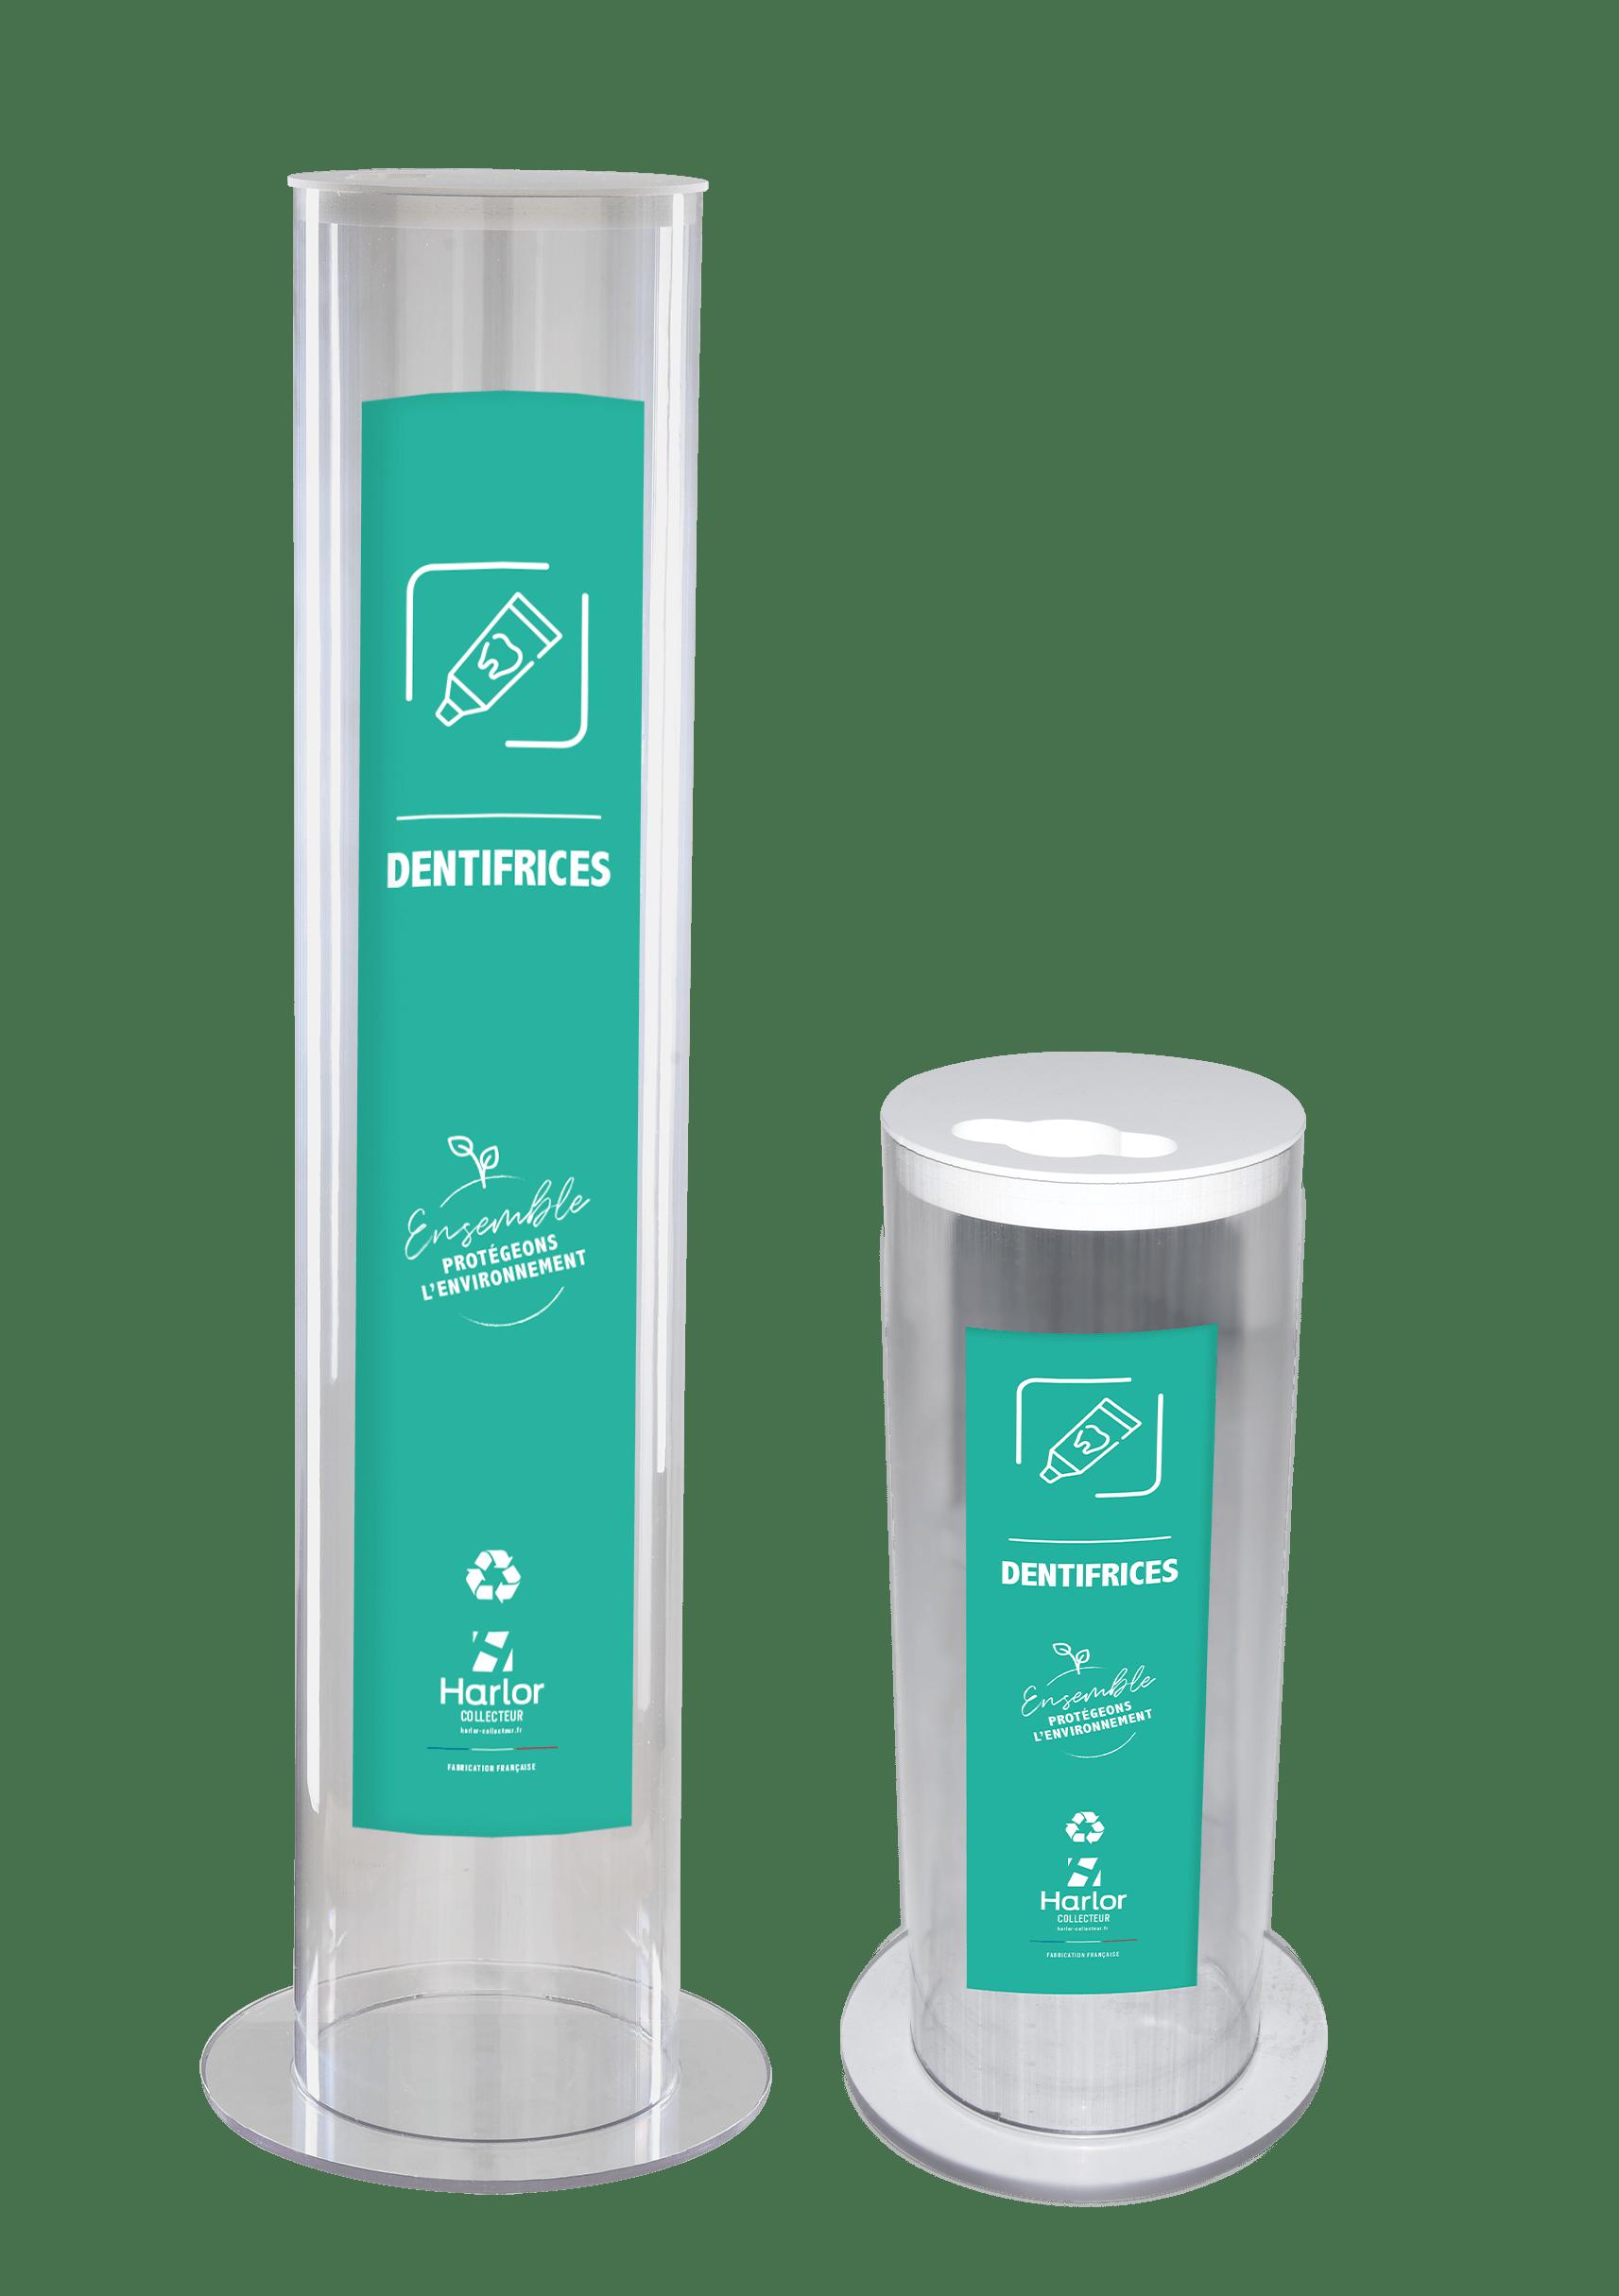 HARLOR COLLECTEUR collecteur dentifrices- poubele pour dentifrice- recyclage dentifrice